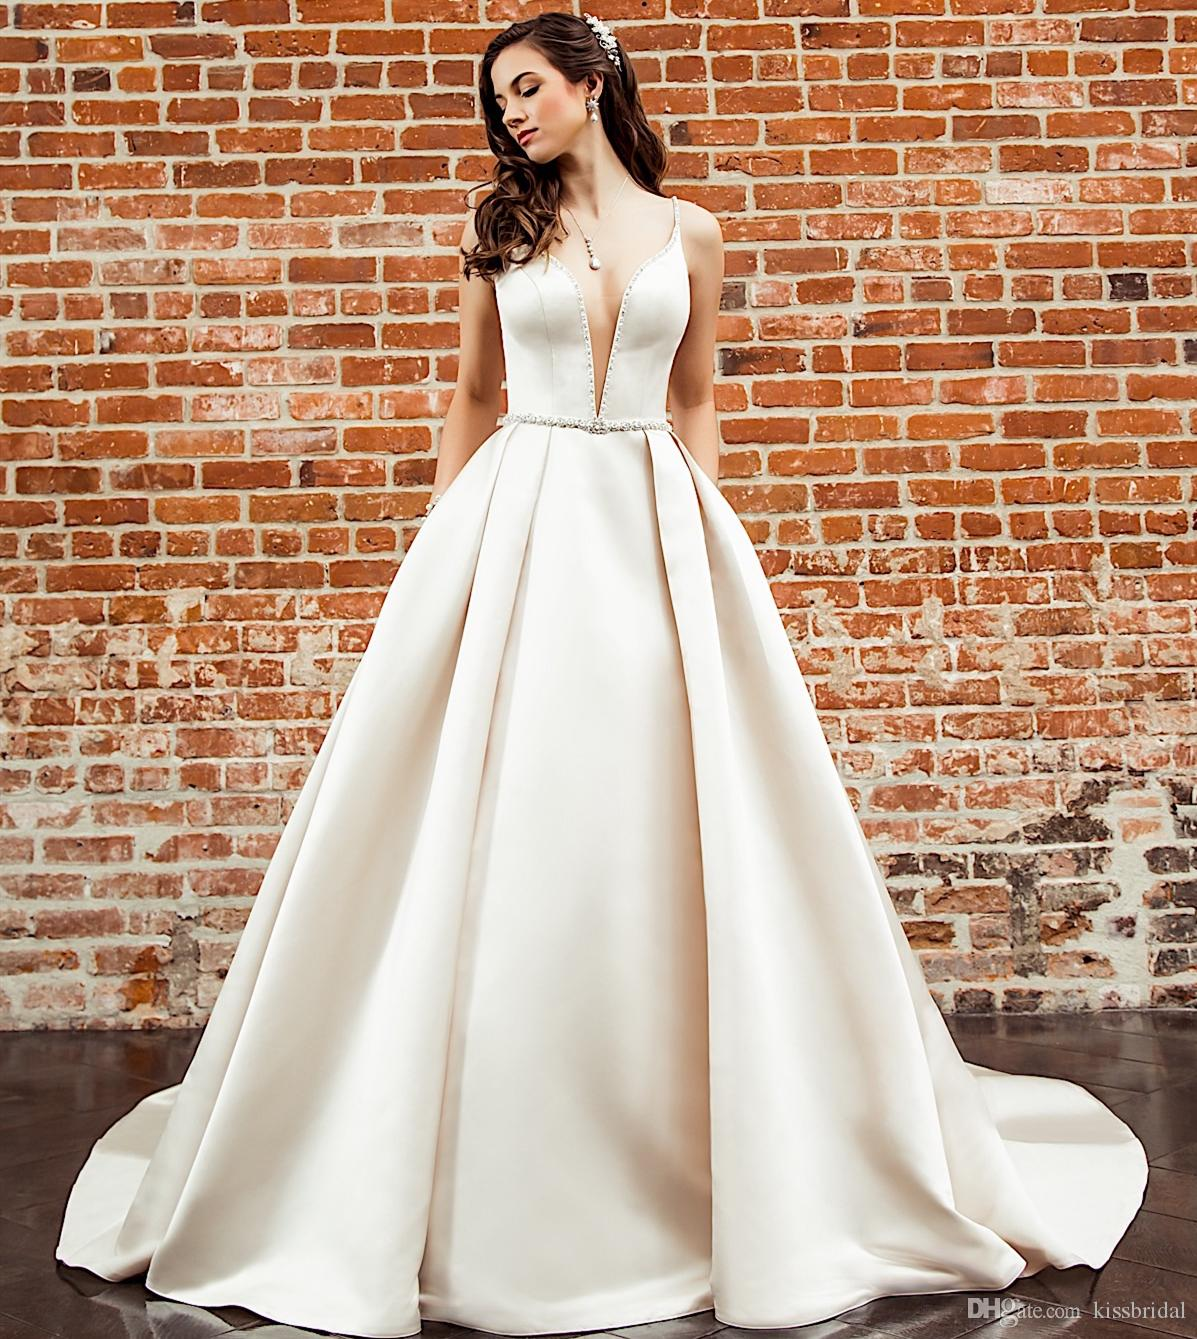 76d4b9b683 Vestidos De Festa Longuete Vestidos De Casamento Simples Barato Vestido De  Novia Mergulho Decote Vestido De Noiva De Cetim Vestidos De Noiva Pura Ver  ...